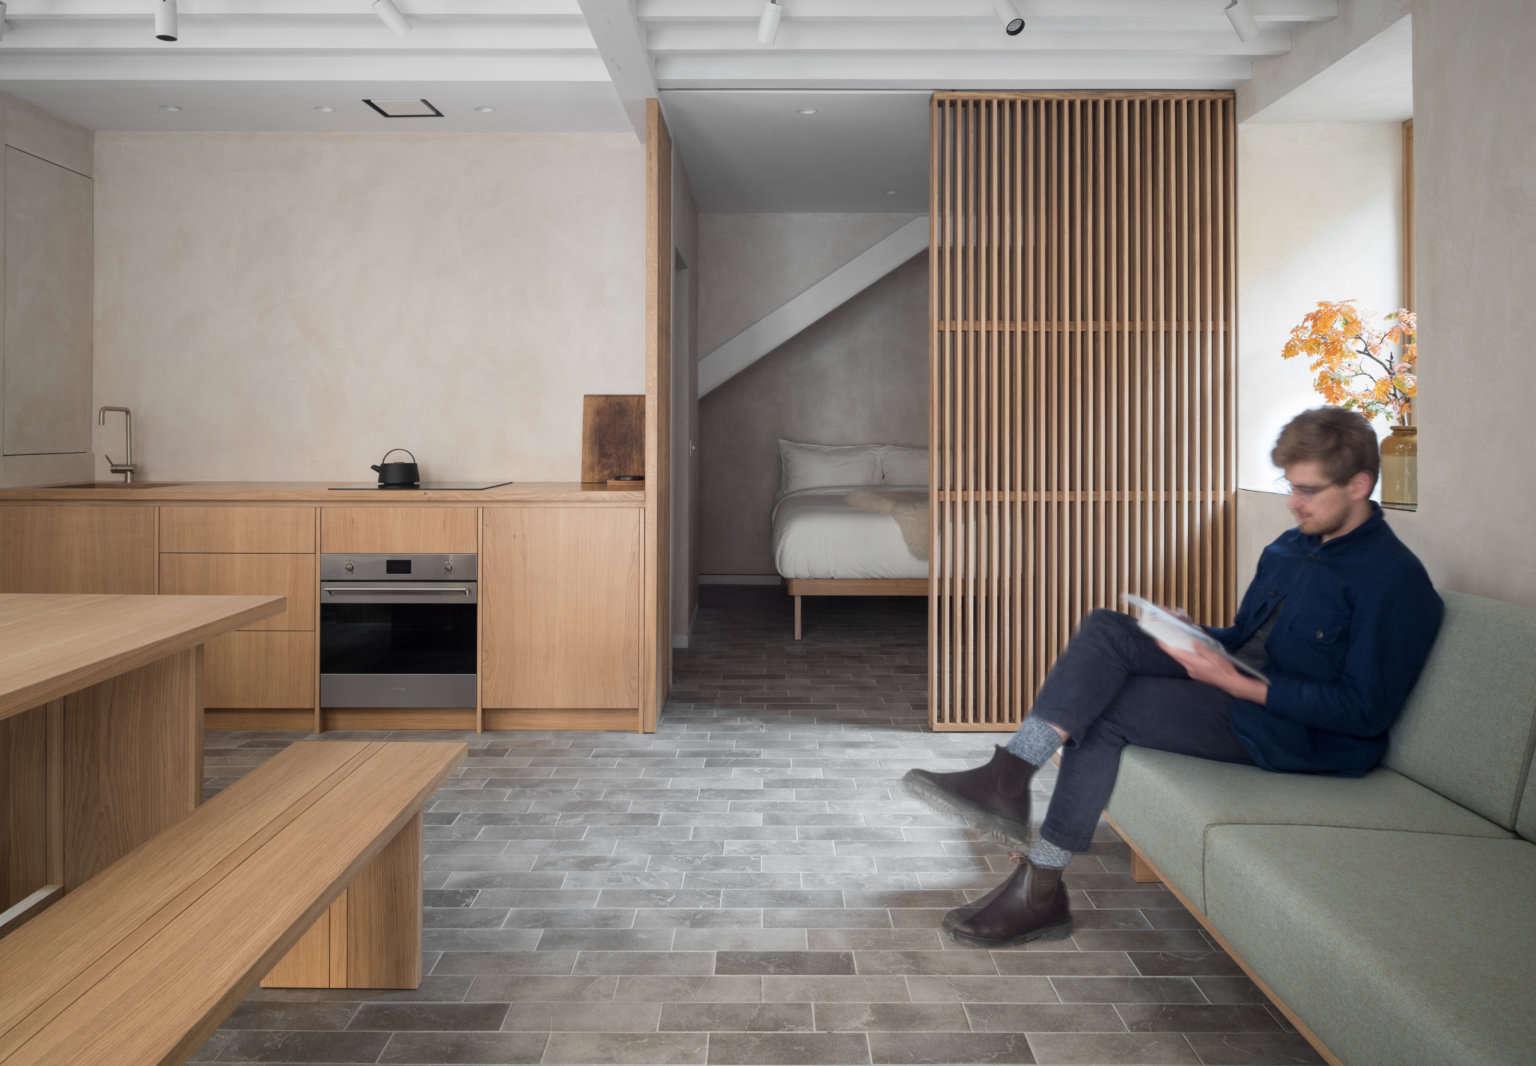 porteous studio interior edinburgh vacation rental izat arundell design zac and zac photo 4